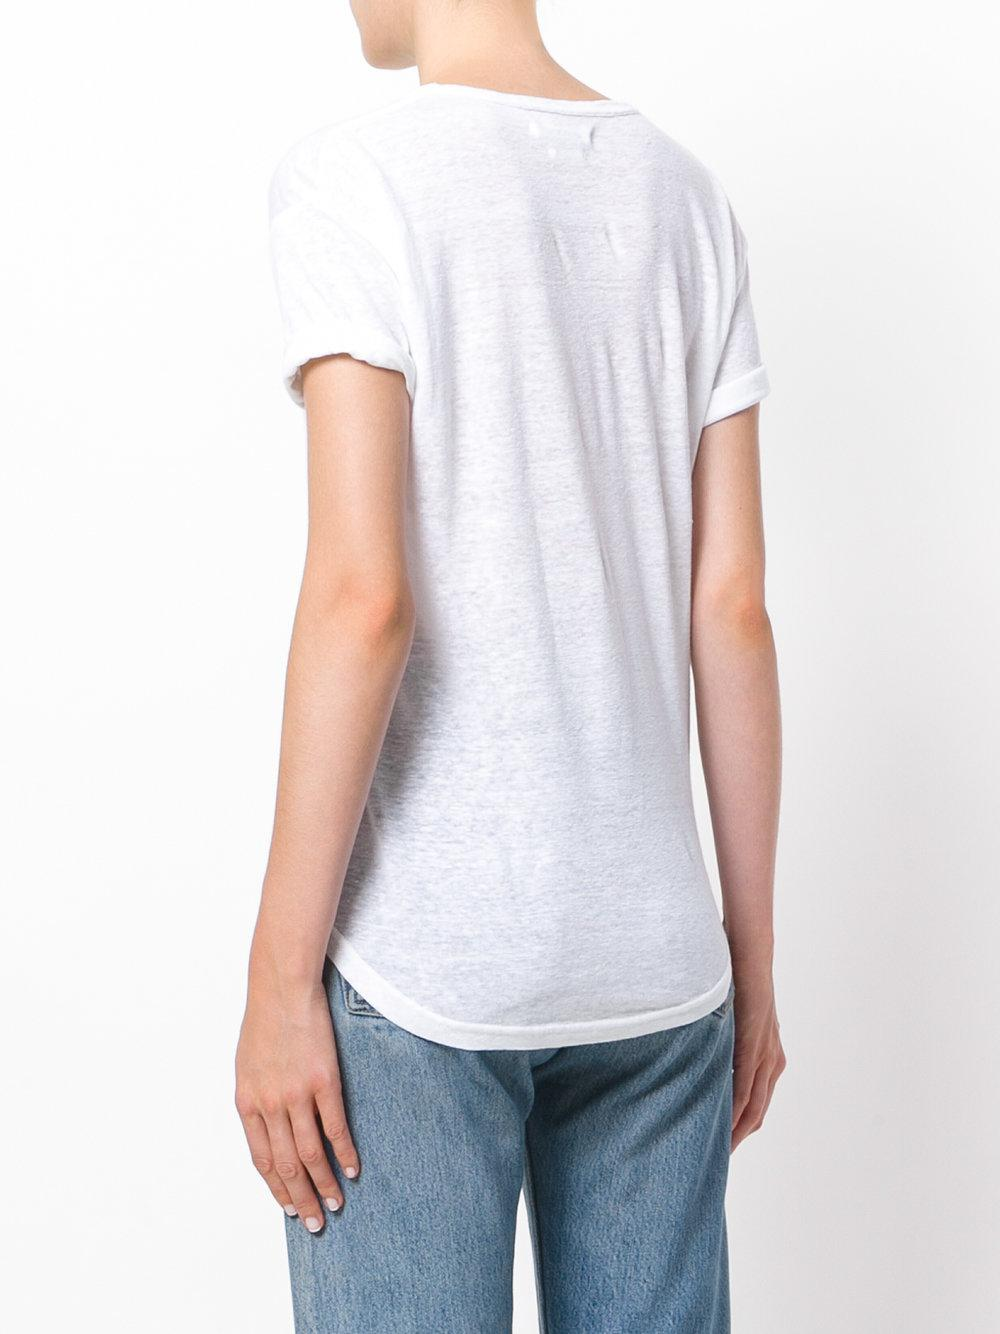 Lyst Toile Isabel Marant Metallic Logo T Shirt In White